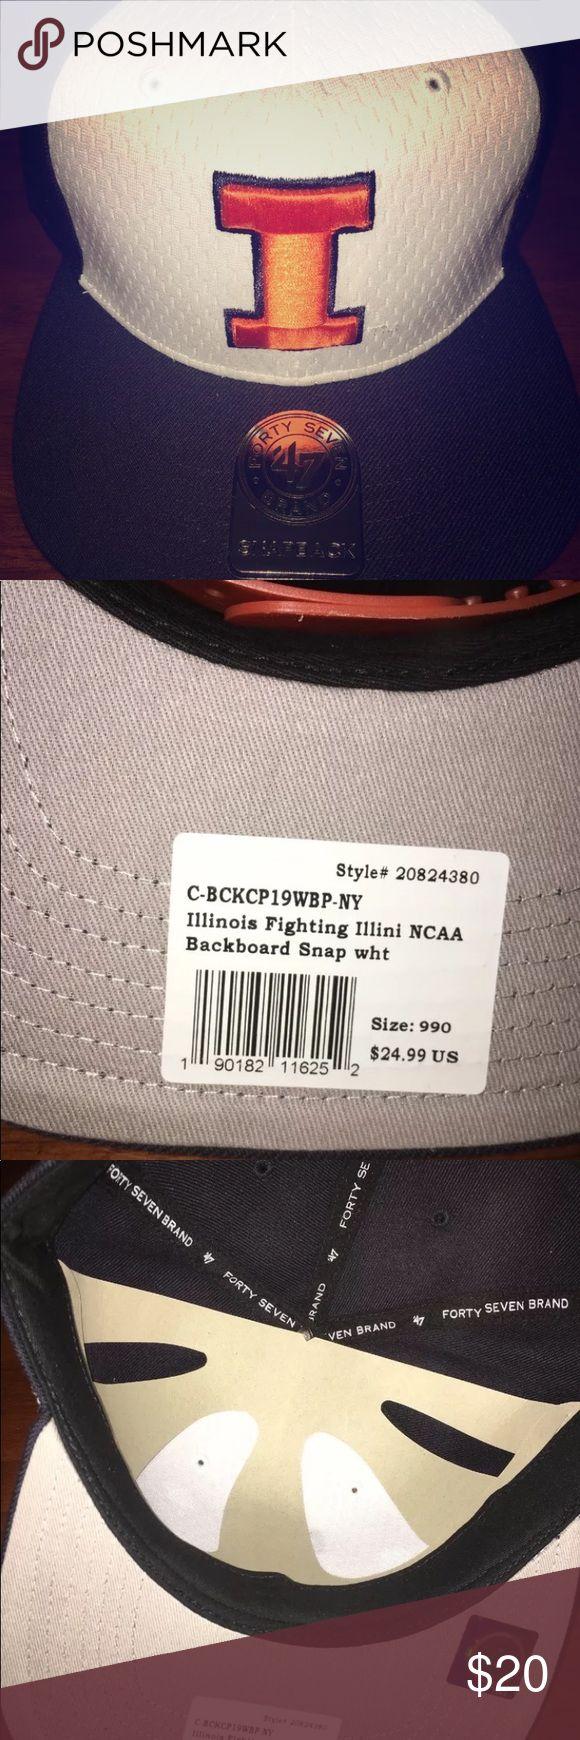 Illinois Fighting Illini NCAA SnapBack Hat Brand New 47 brand Accessories Hats